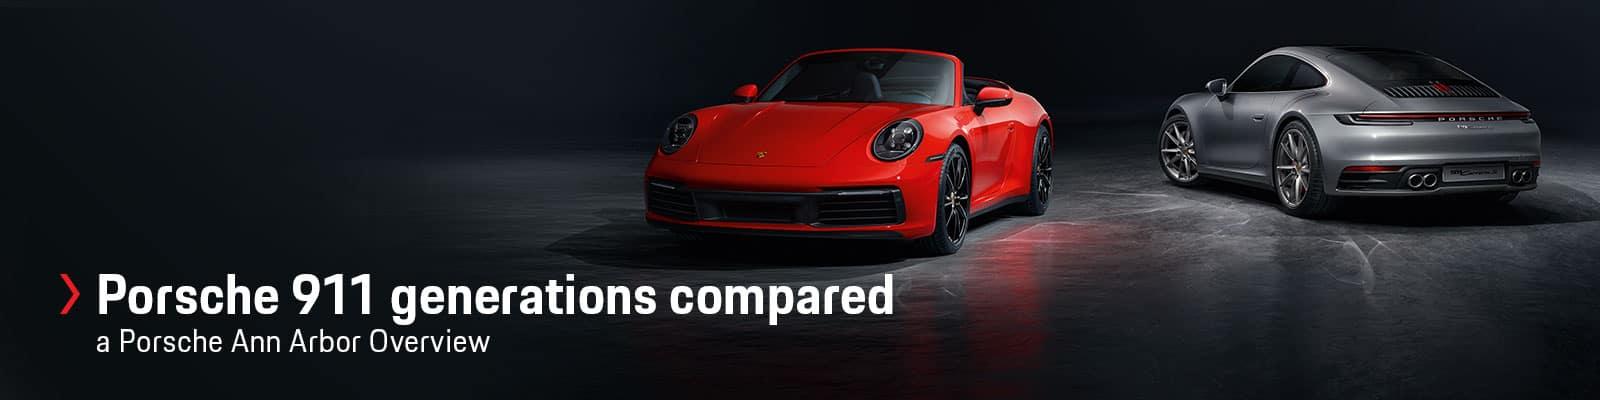 Porsche 911 Generations Compared at Sewickley Porsche